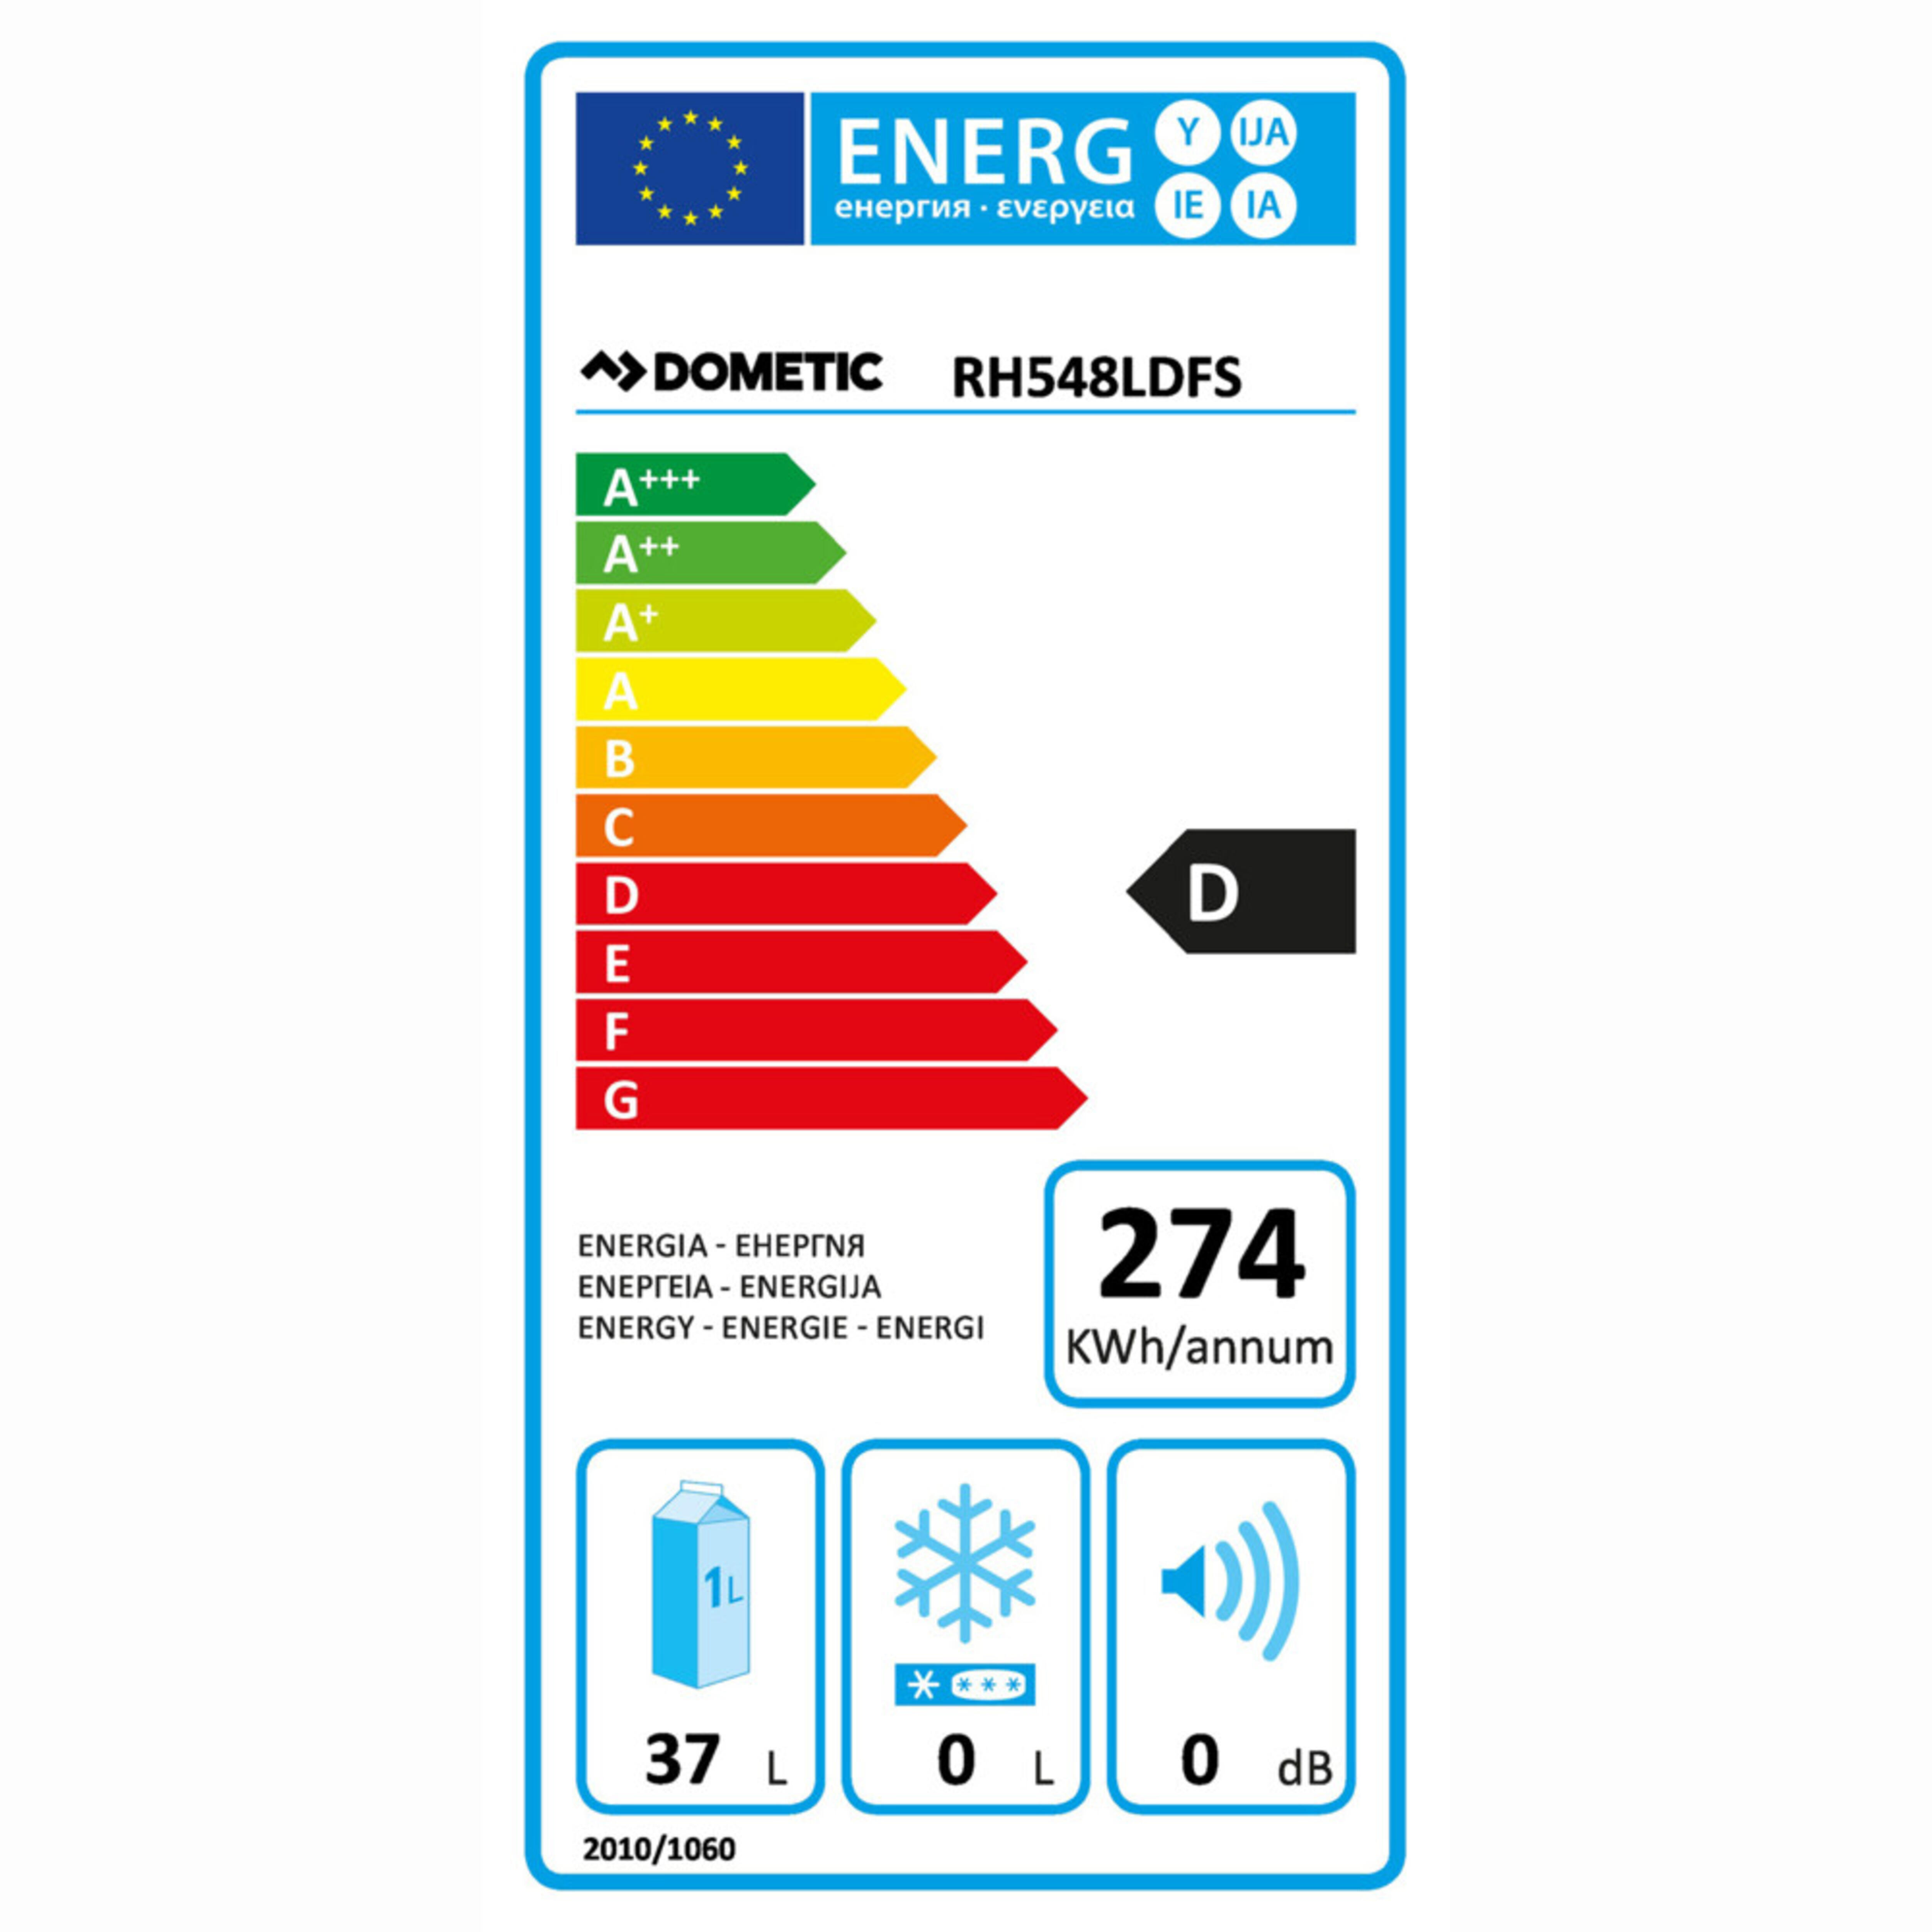 Dometic RH 548 LDFS Energy label